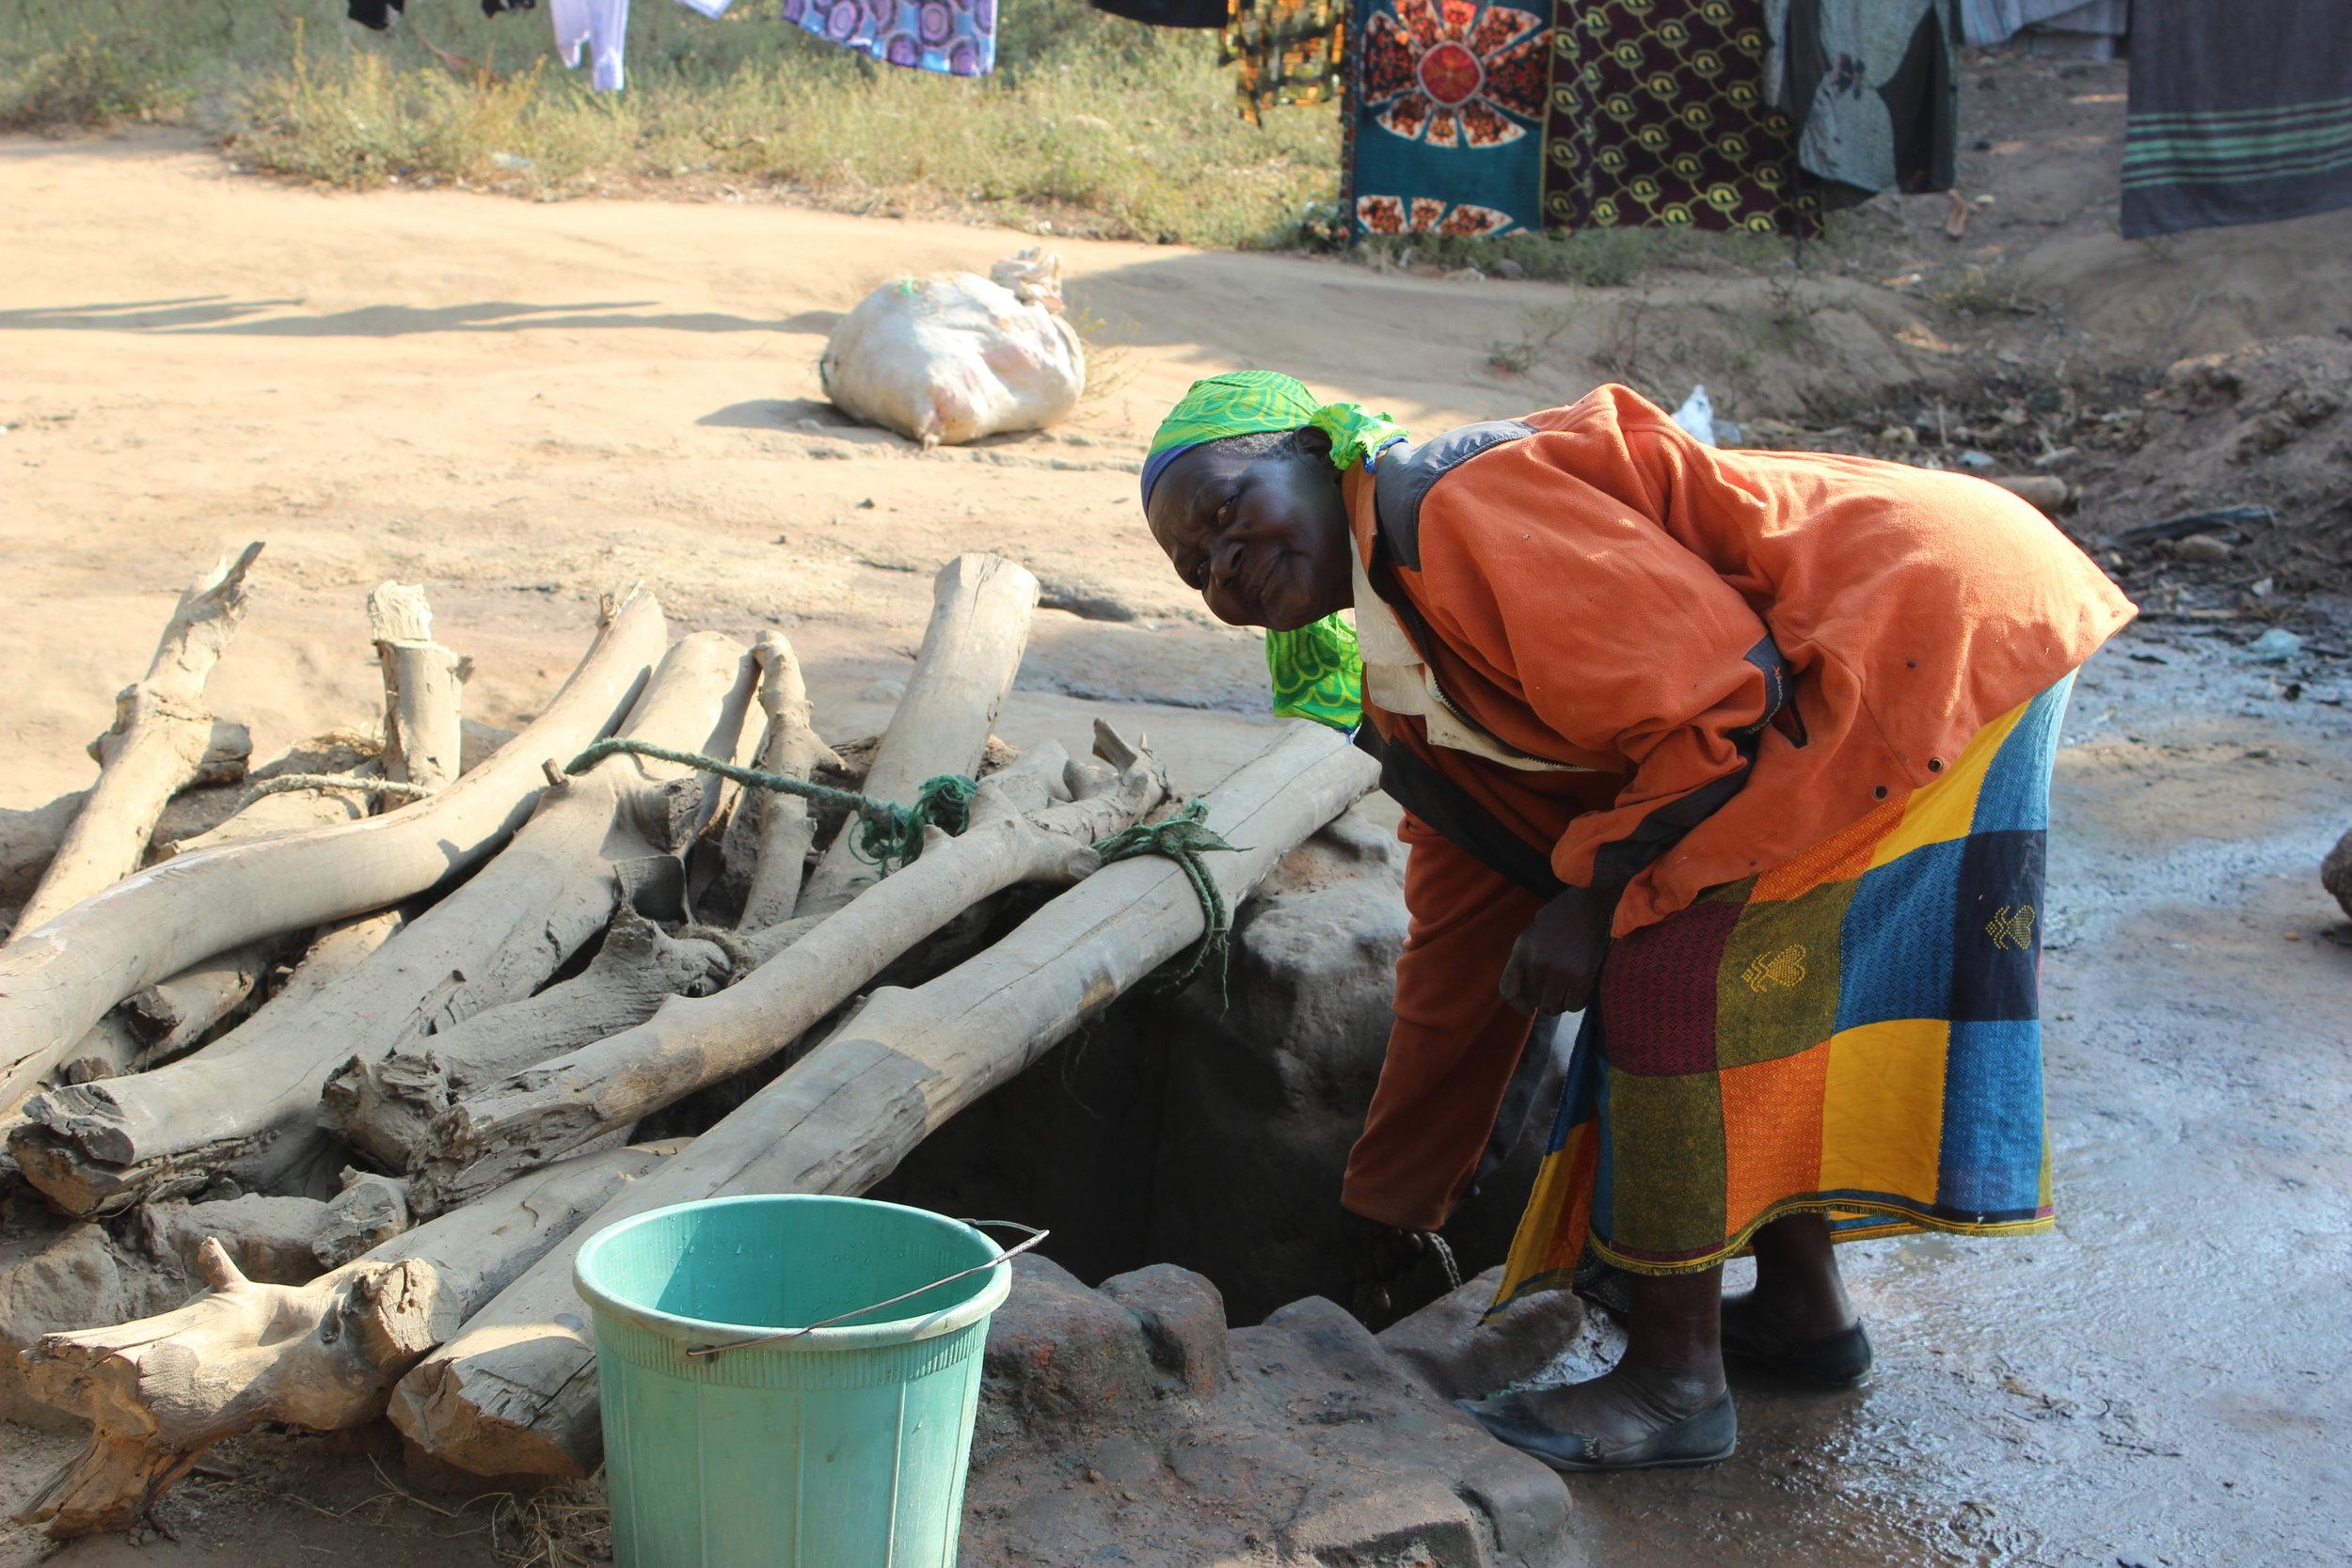 A Malawian grandmother drawing water from a hand dug well. Photo credit: Karen Roller 07/17